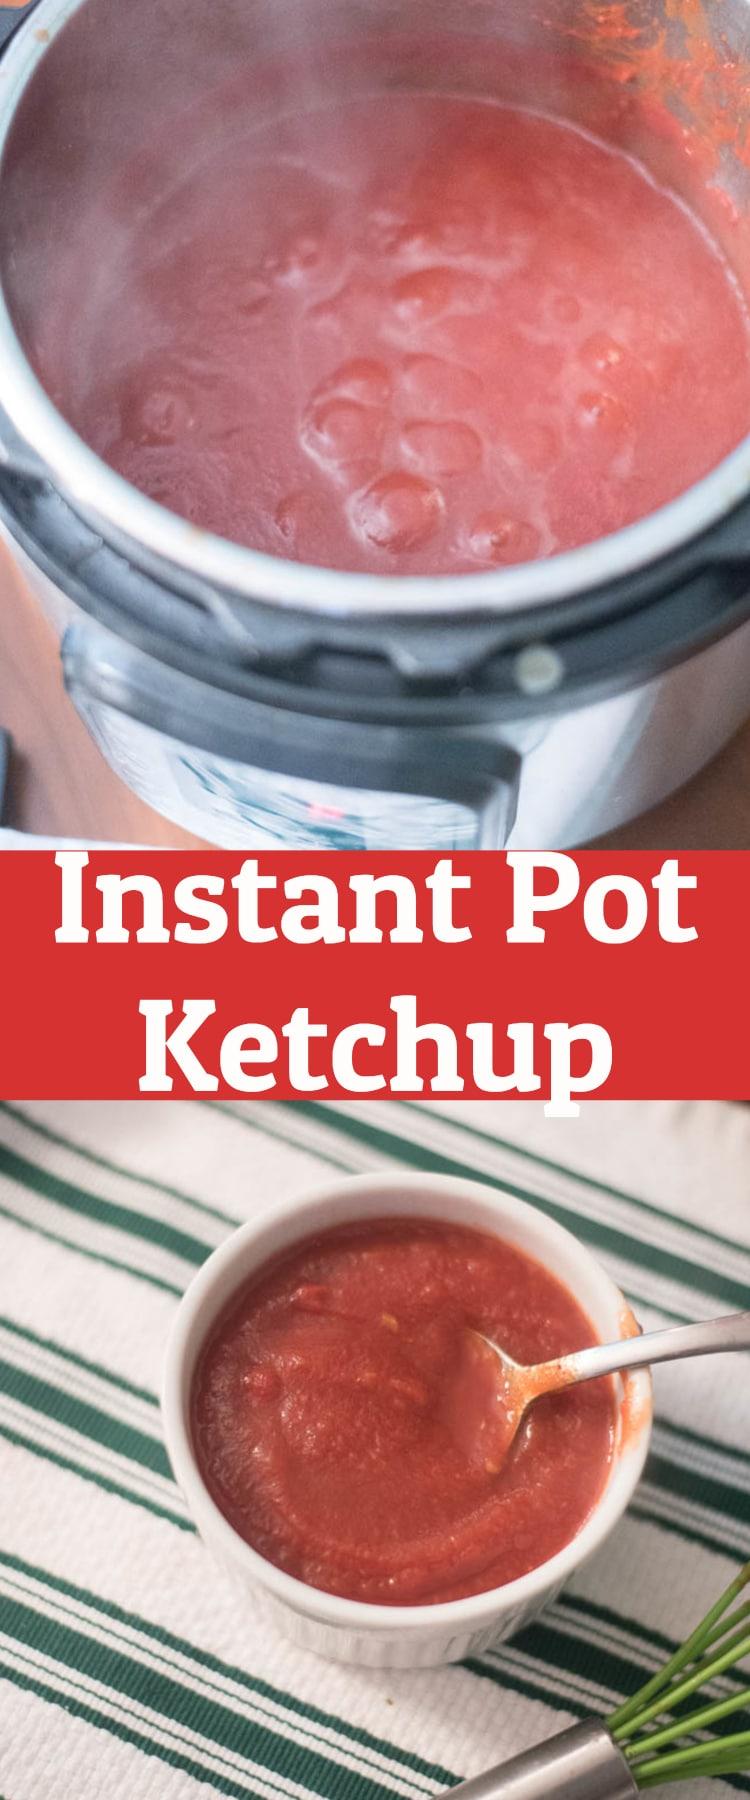 instant pot ketchup / pressure cooker ketchup / instant pot recipe / easy instant pot / pressure cooker #instantpot #pressurecooker